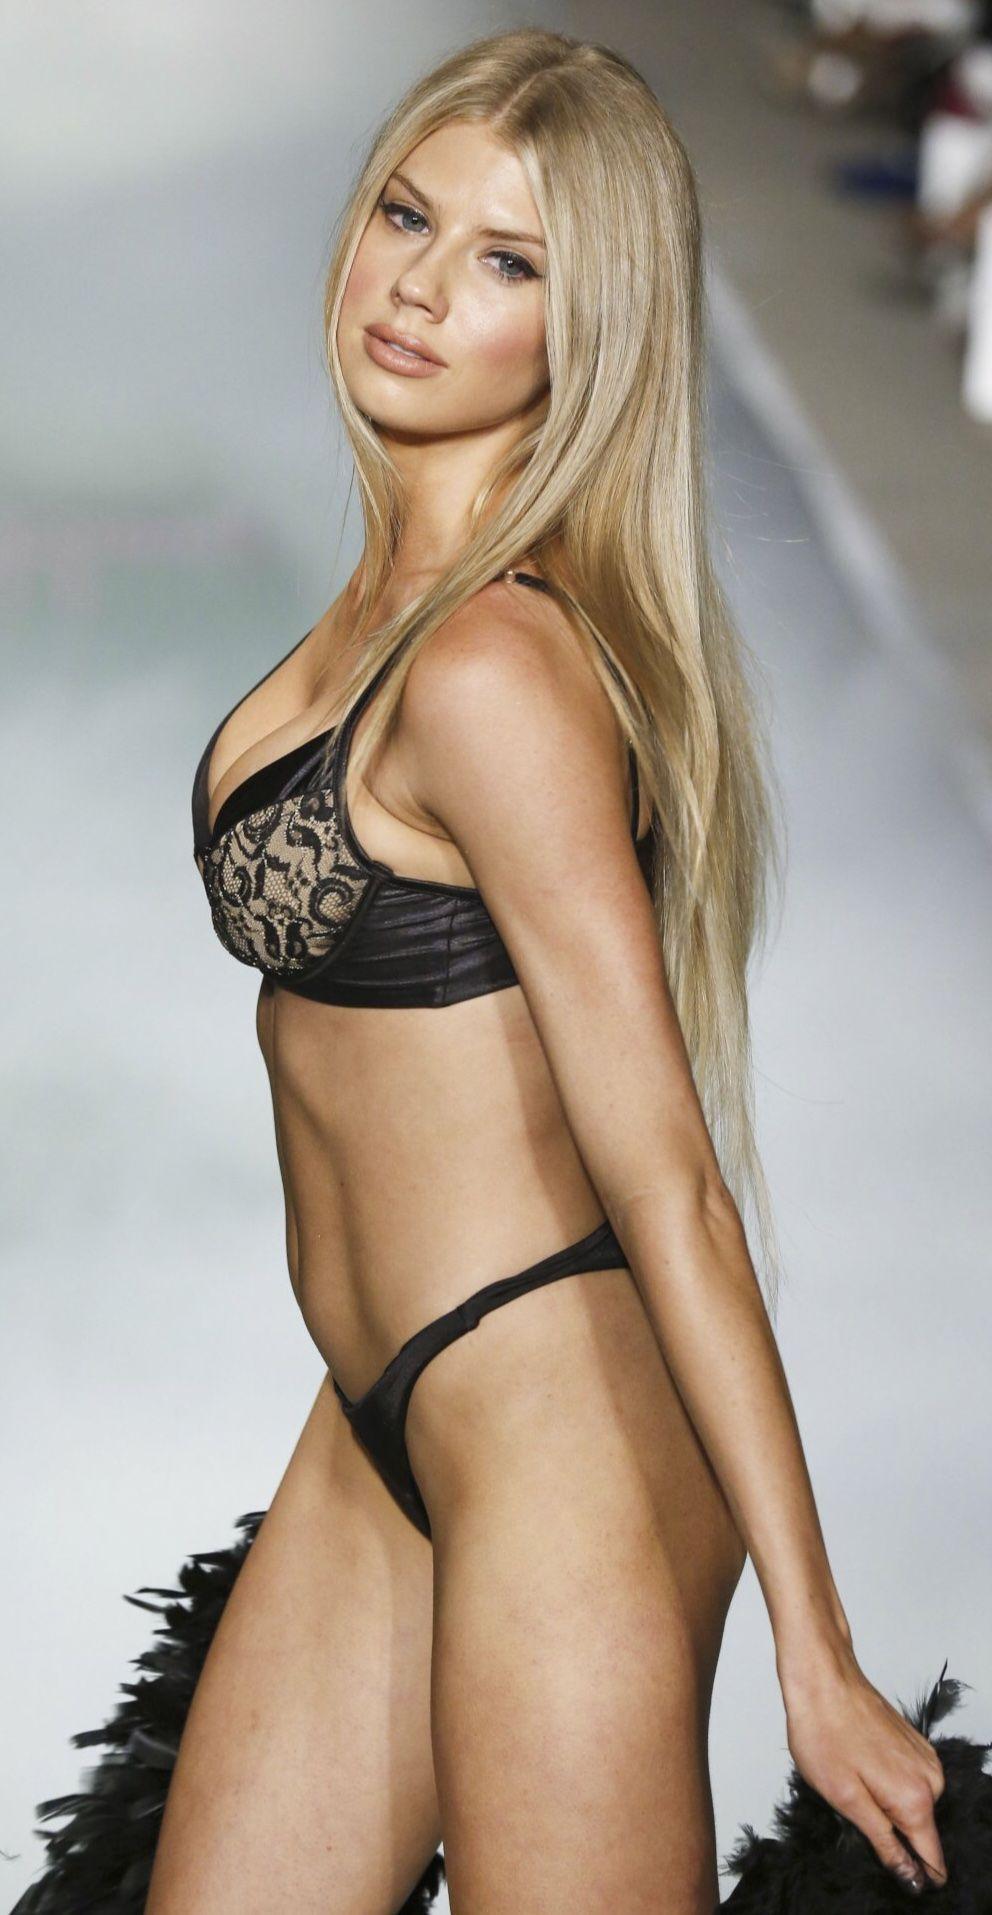 Charlotte McKinney's Tit Pops Out During Bikini Dance naked (47 photos), Twitter Celebrity photos